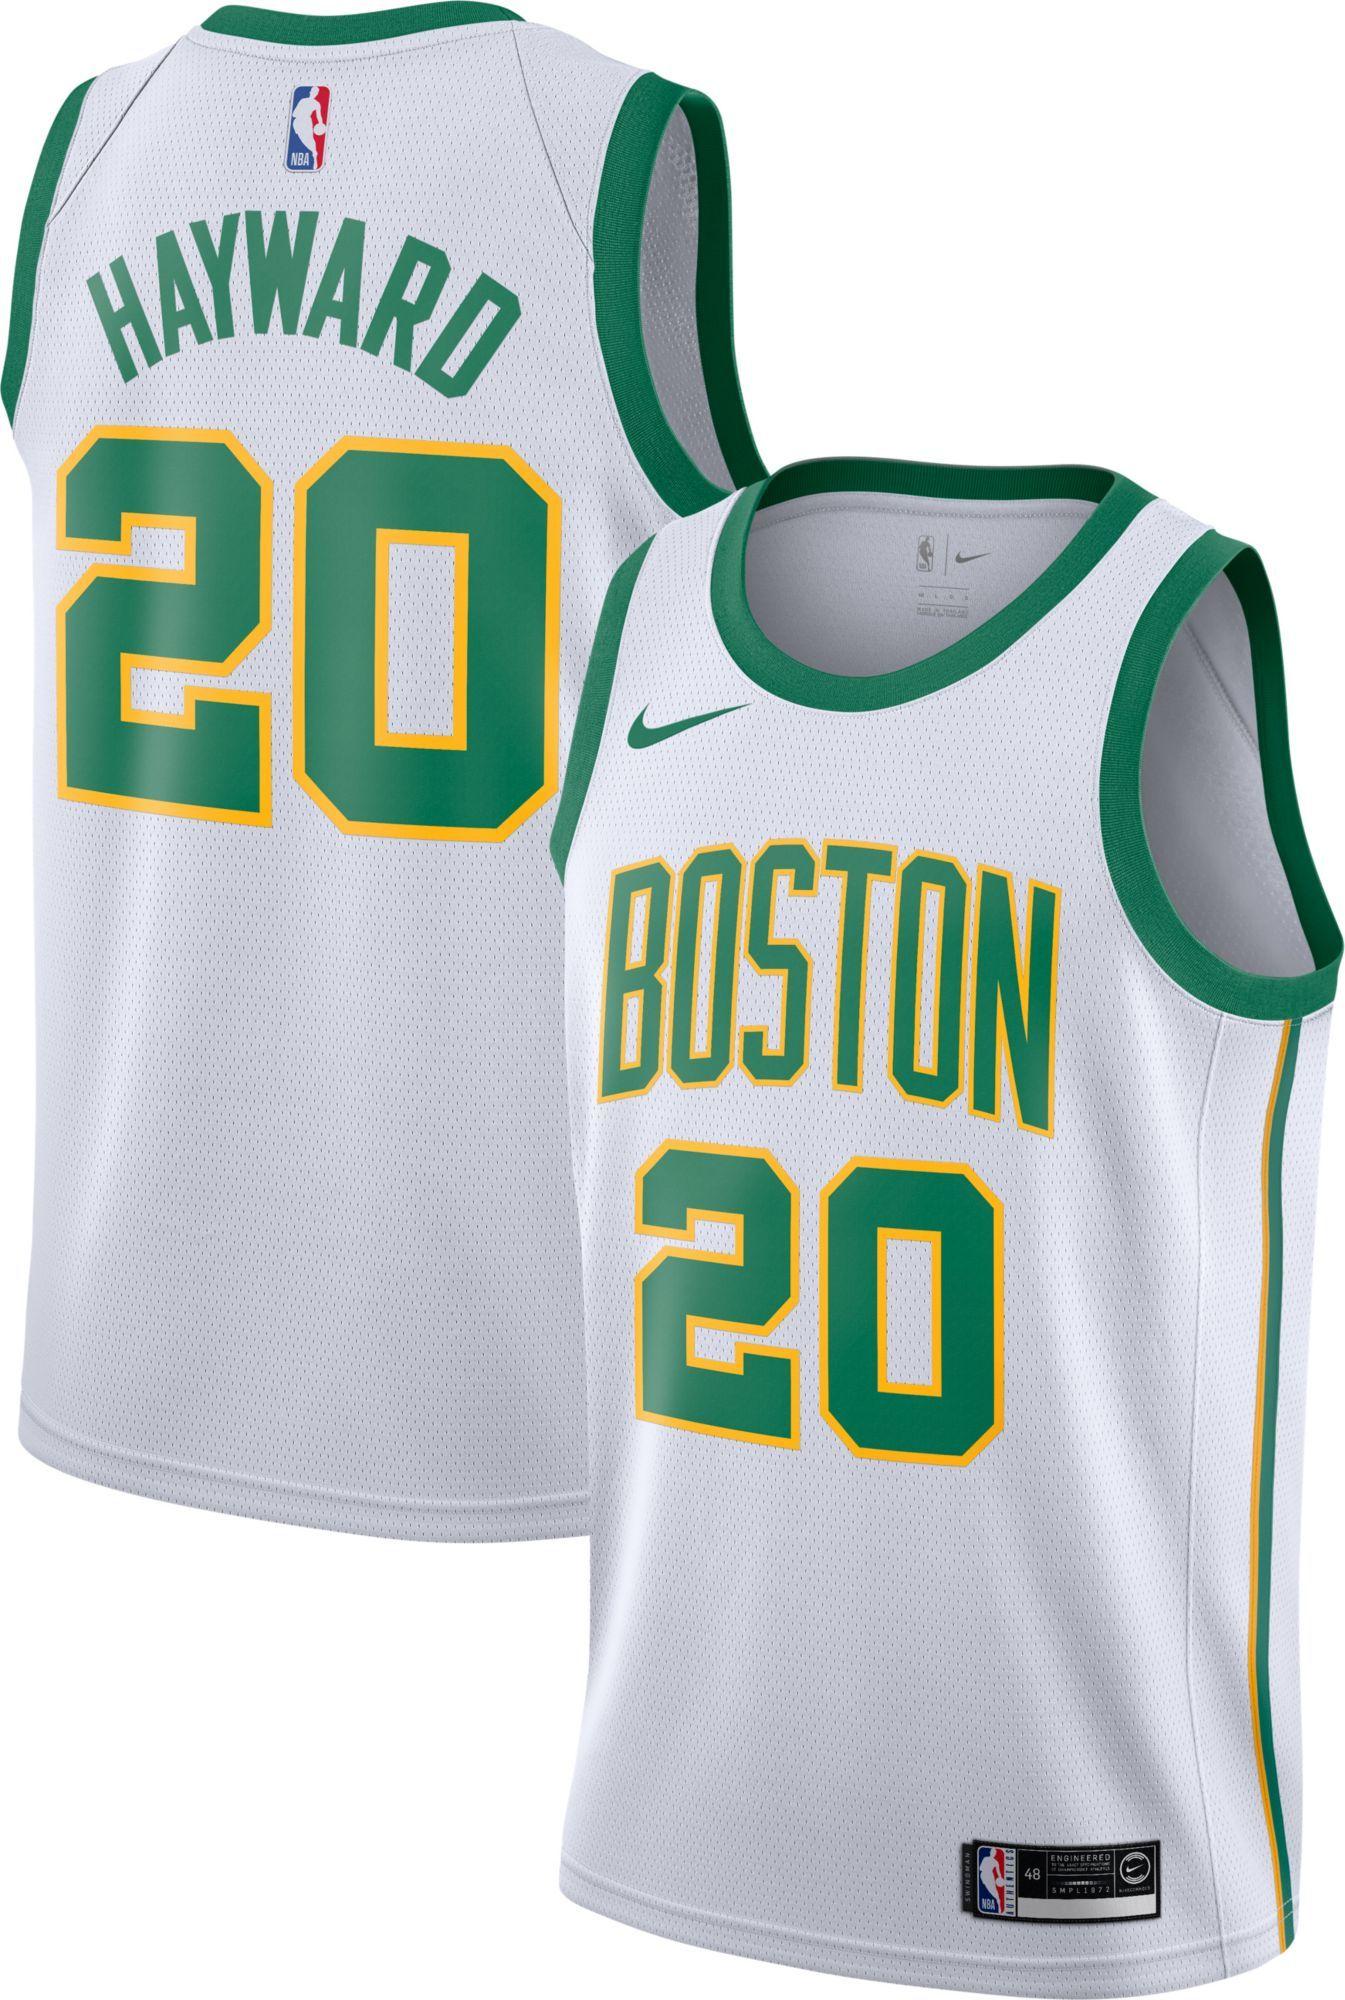 4bad9f37bc1 Nike Men's Boston Celtics Gordon Hayward Dri-FIT City Edition Swingman  Jersey